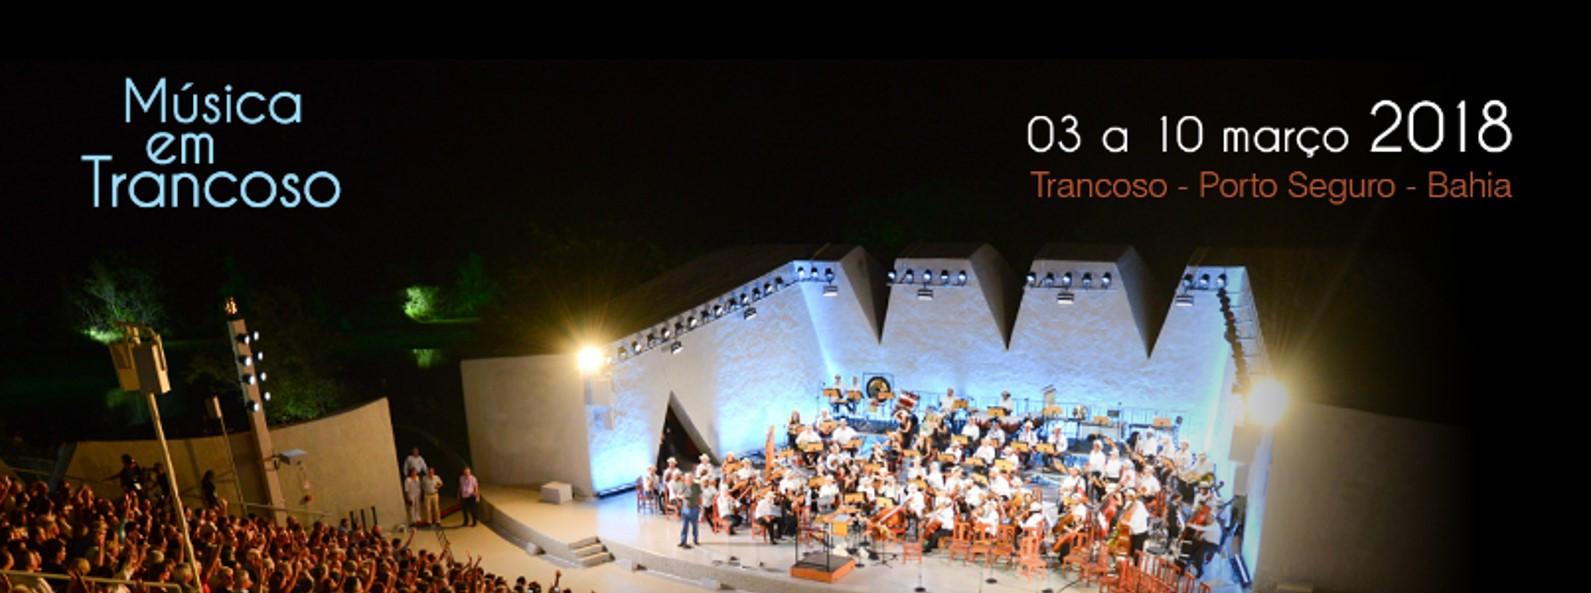 Save the date: Música em Trancoso